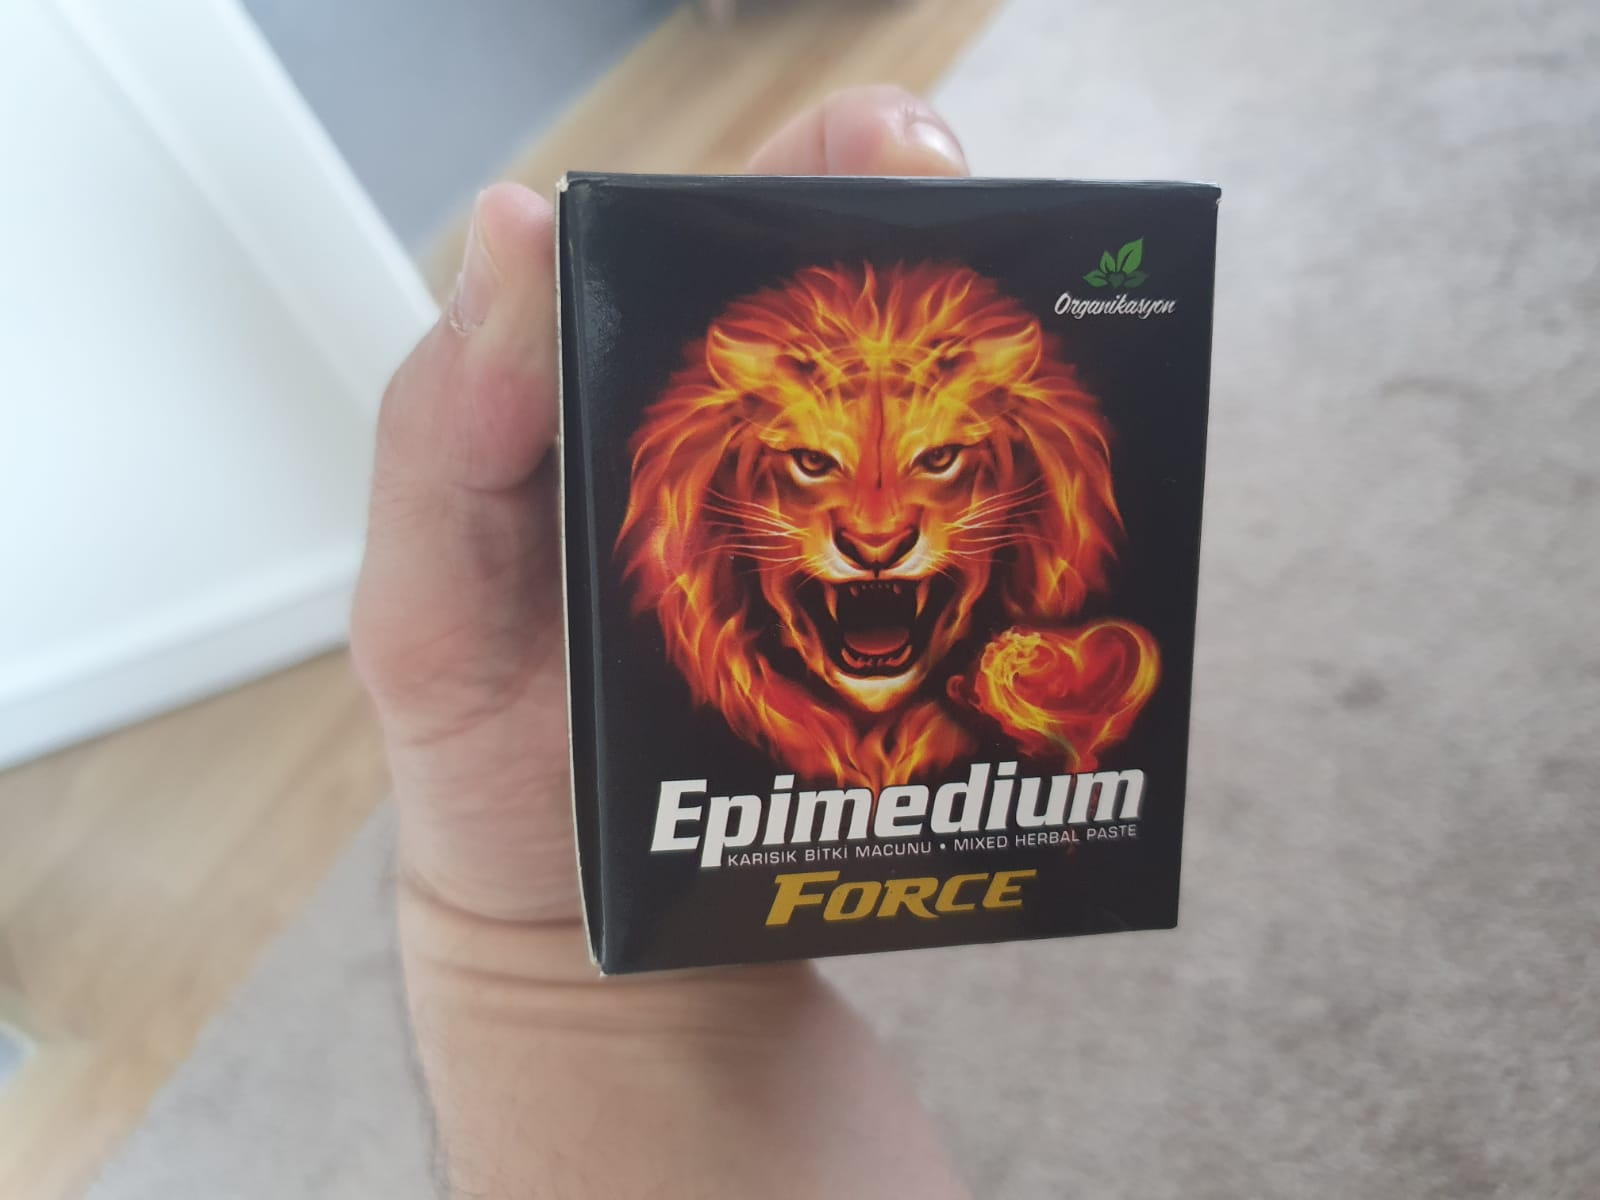 En etkili kuvvet macunu Epimedium Force